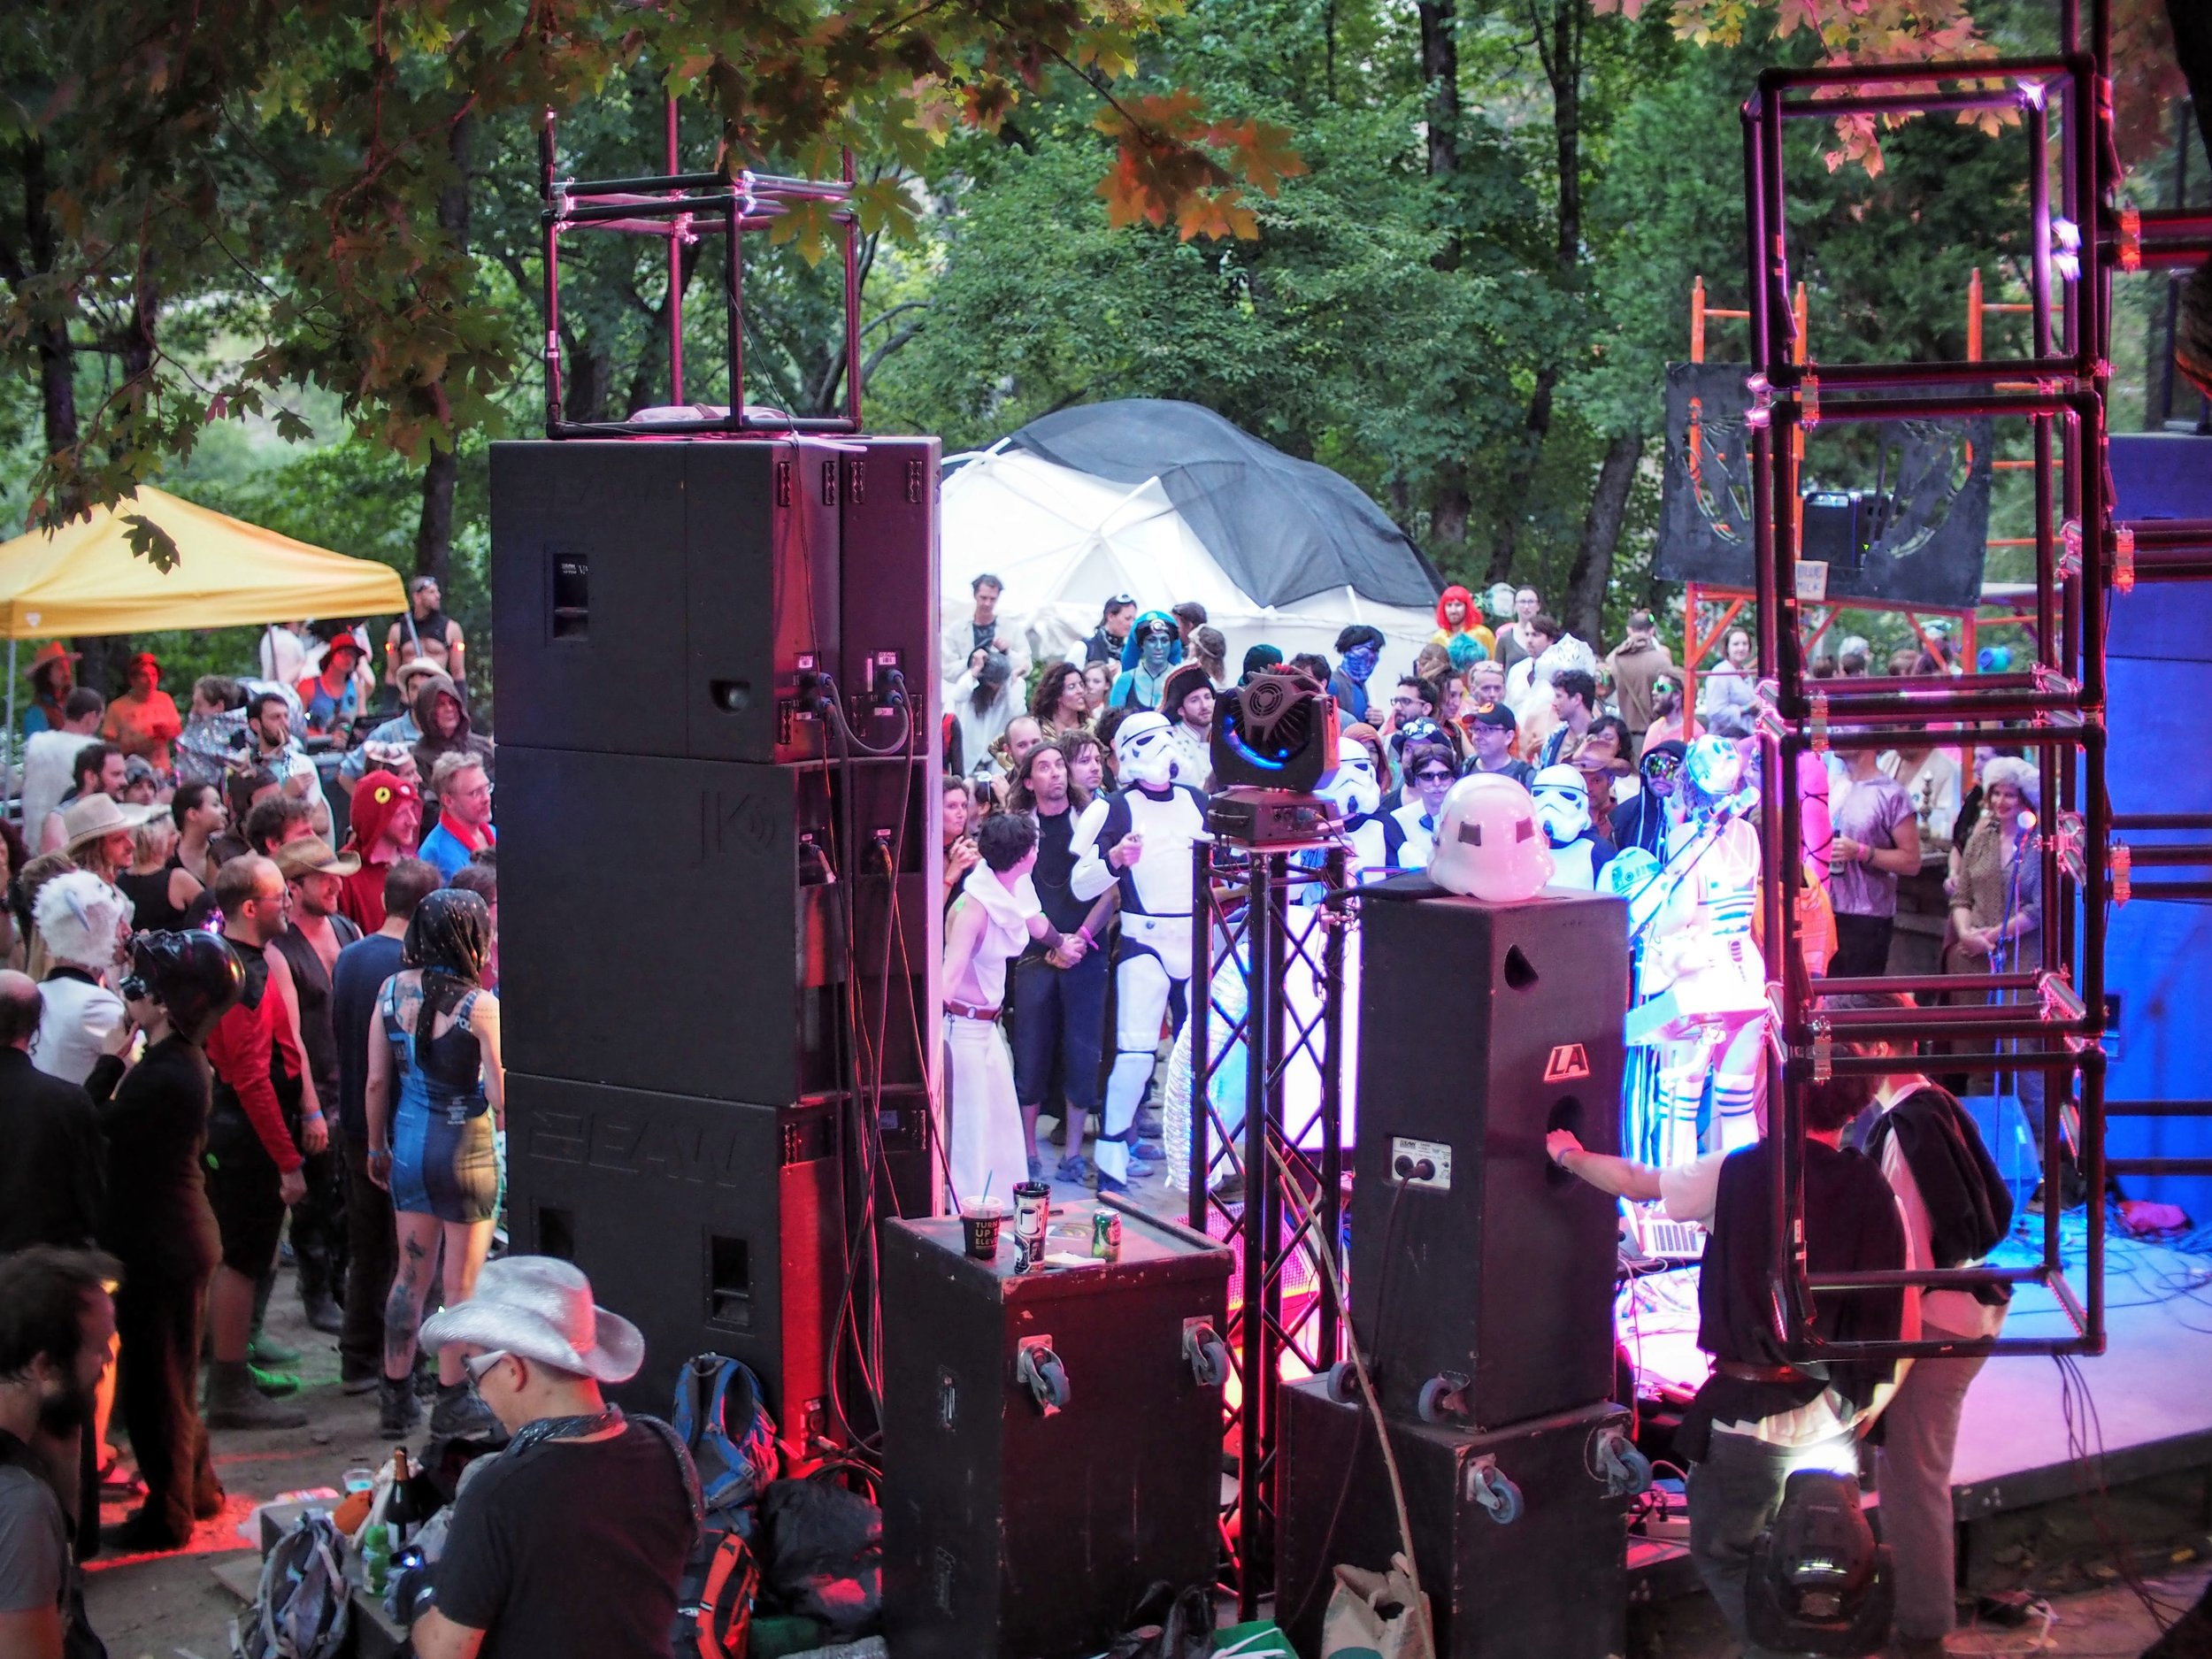 Mos Eisley Cantina—Priceless Festival